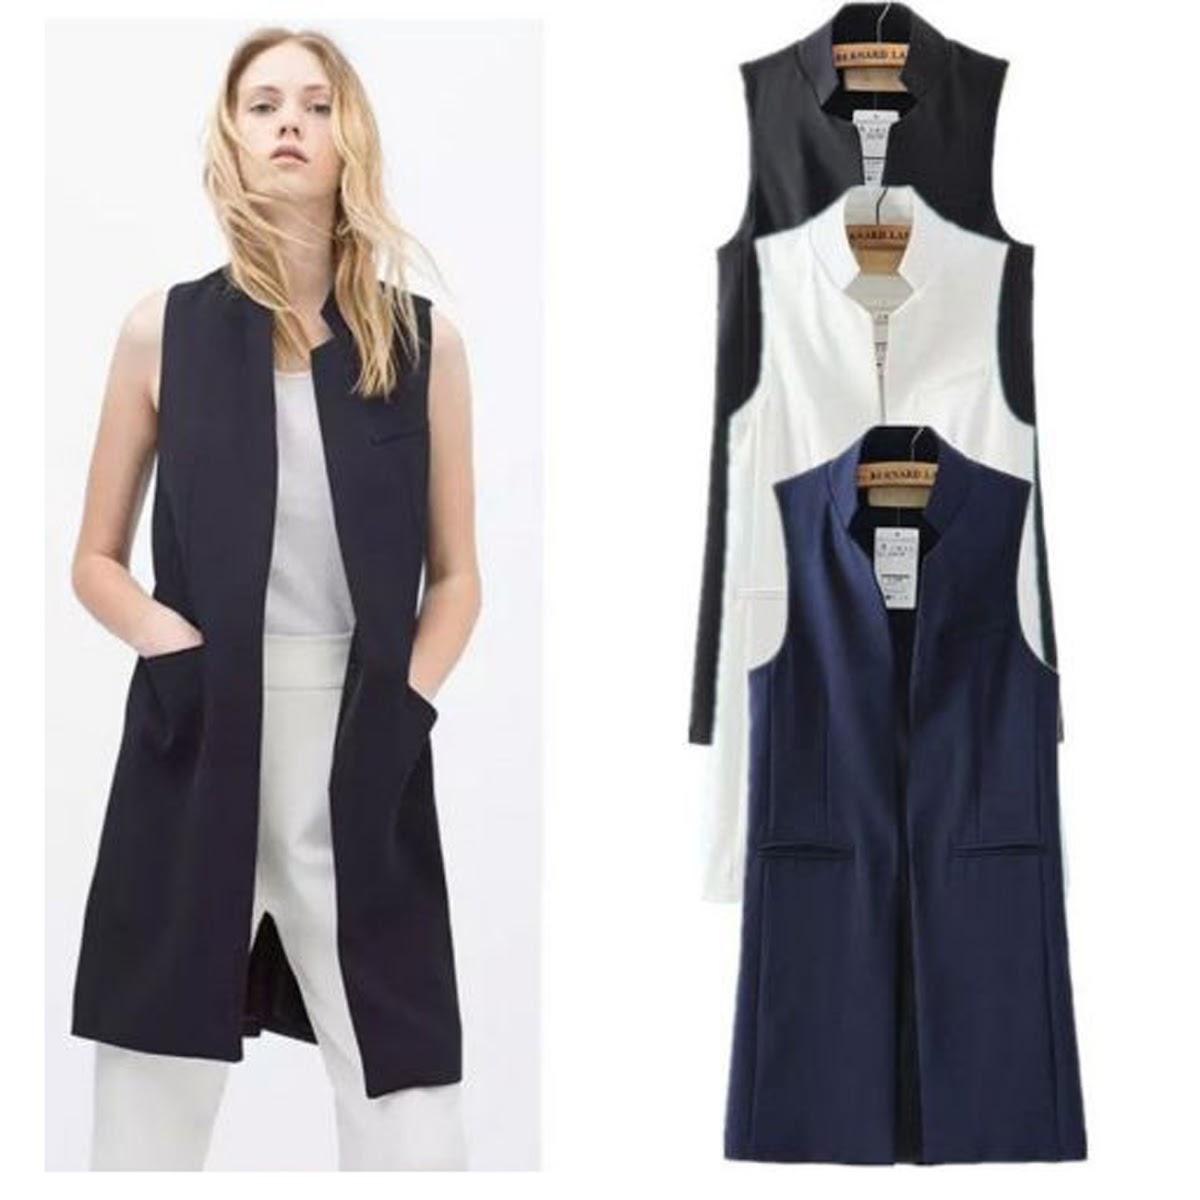 676b166b1f132a 2019 Women S Mandarin Collar Open Front Long Vest Waistcoat Cardigan Blazer  Sleeveless Jacket Outfit Women Long Business Suit Vest From Yukime